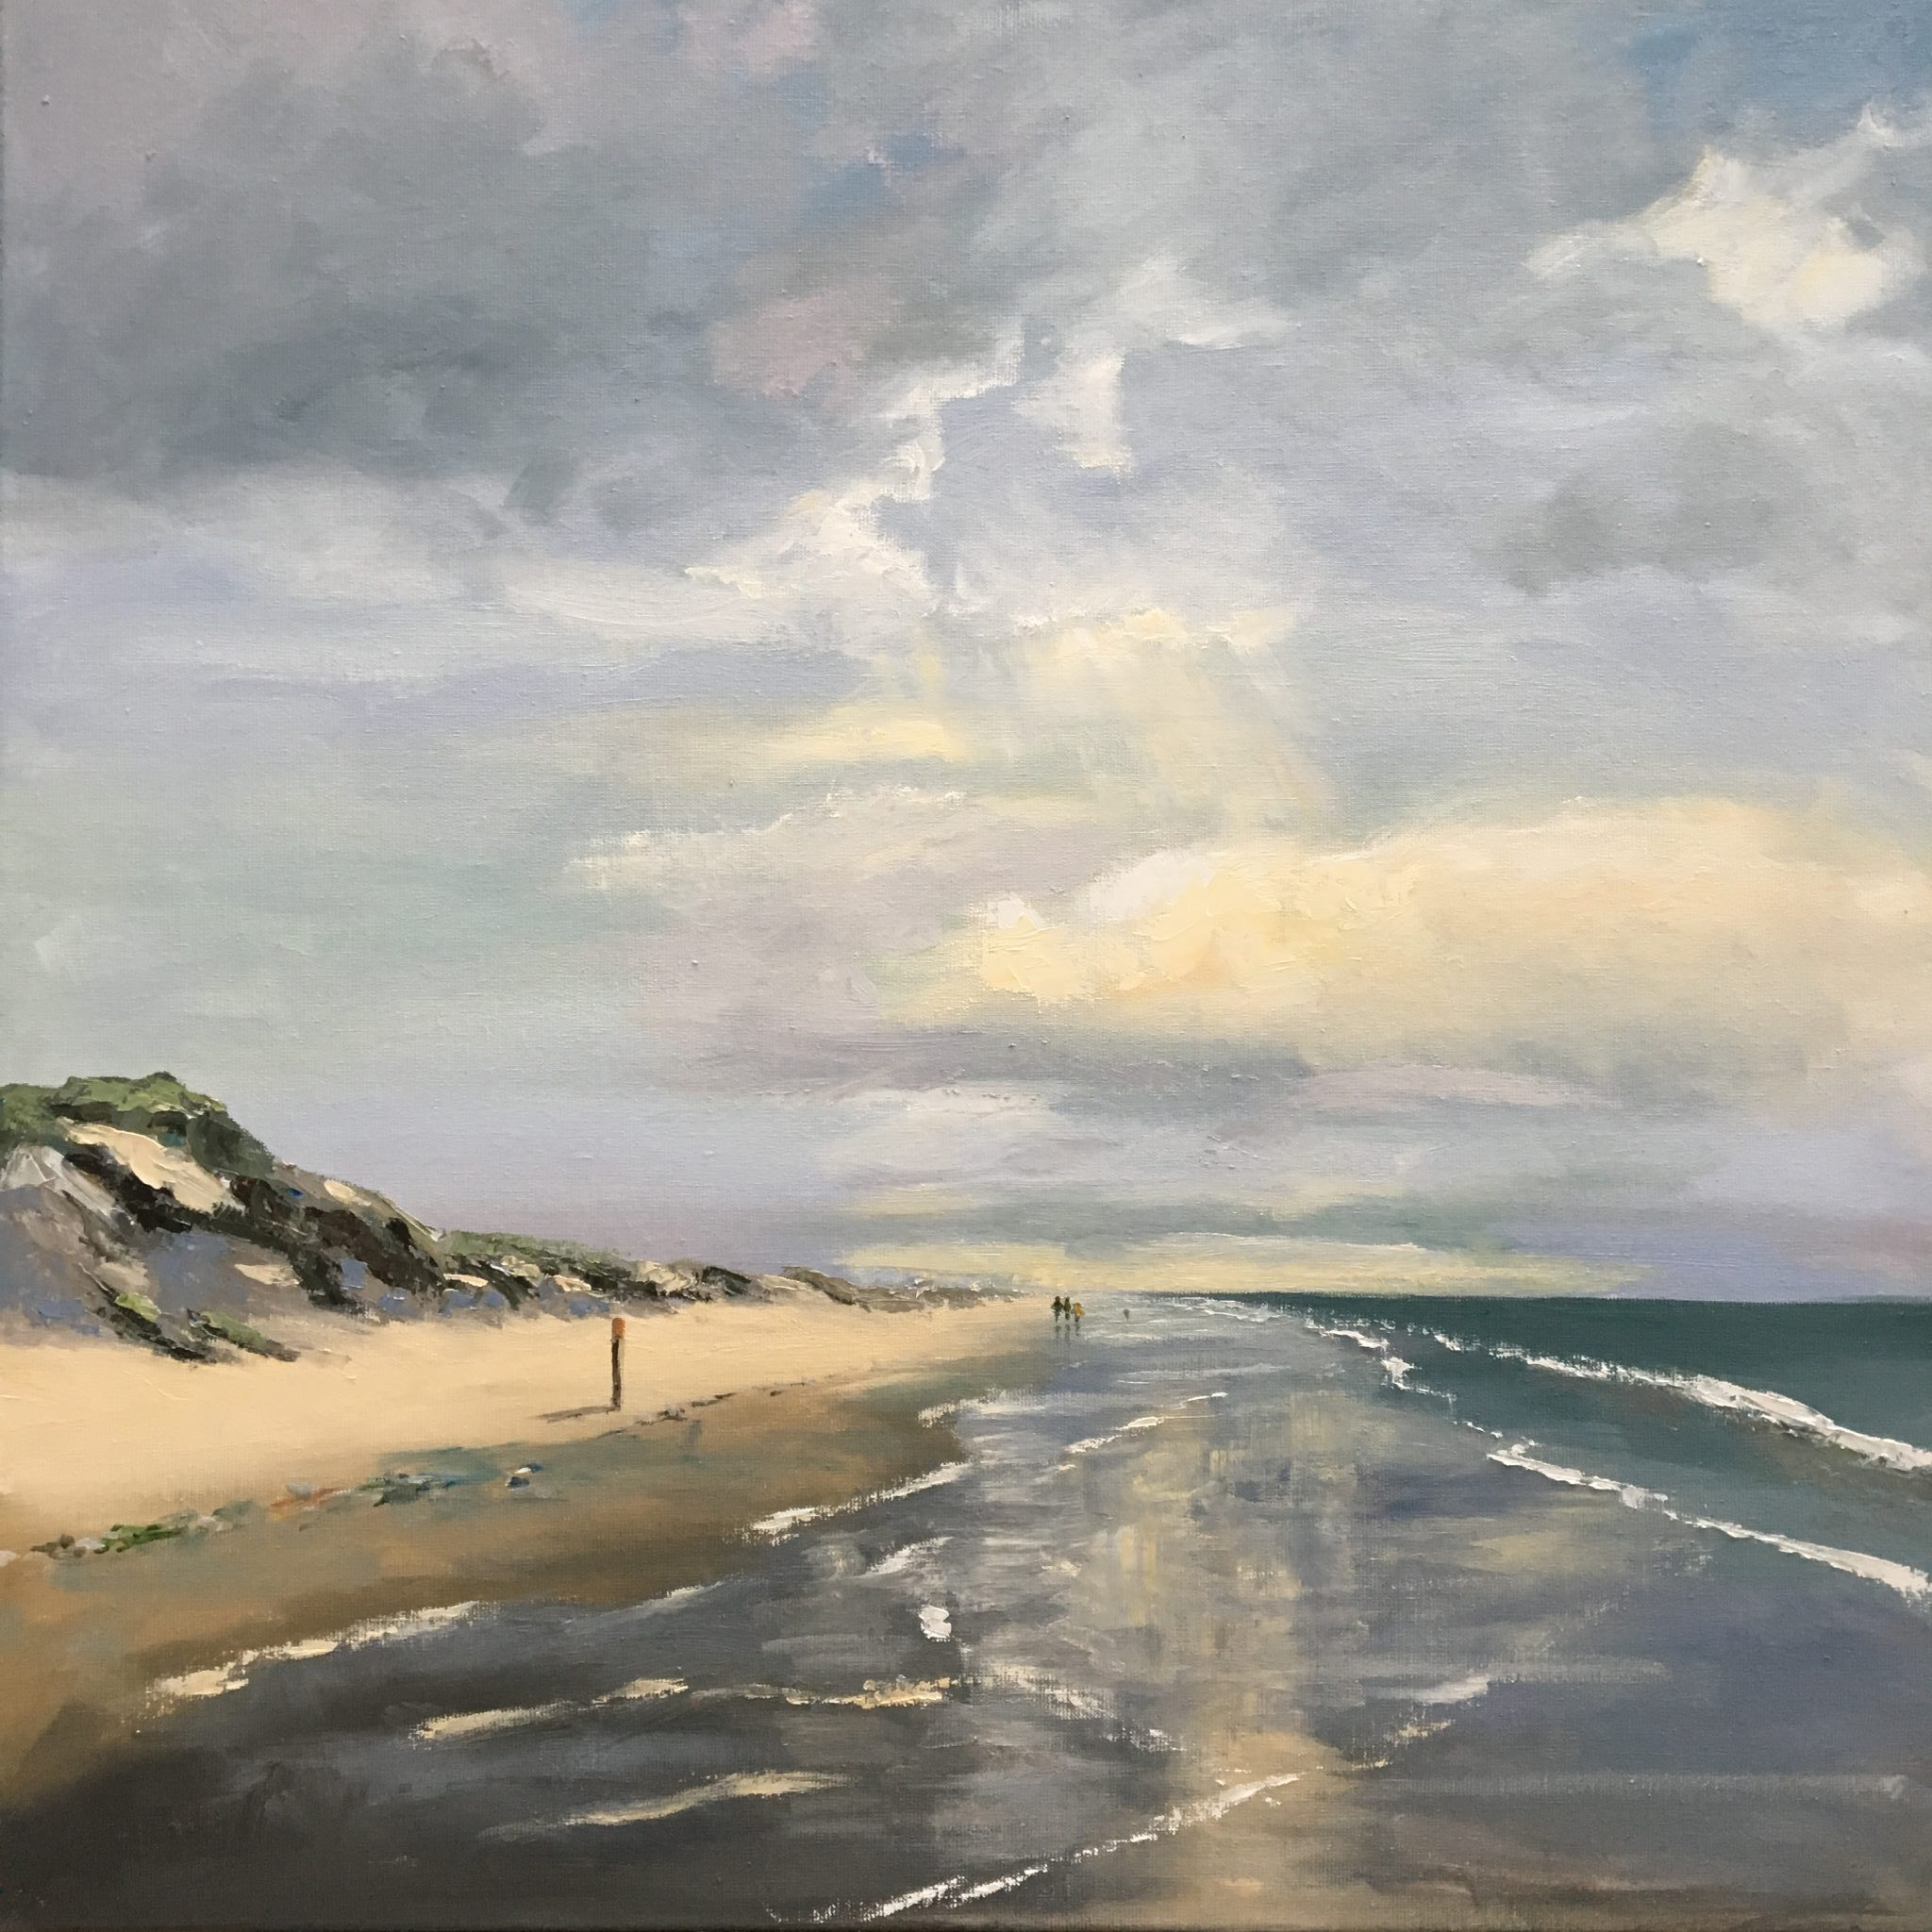 winterdaystroll-reflections-seascape-seaview-beach-Heleen van Lynden